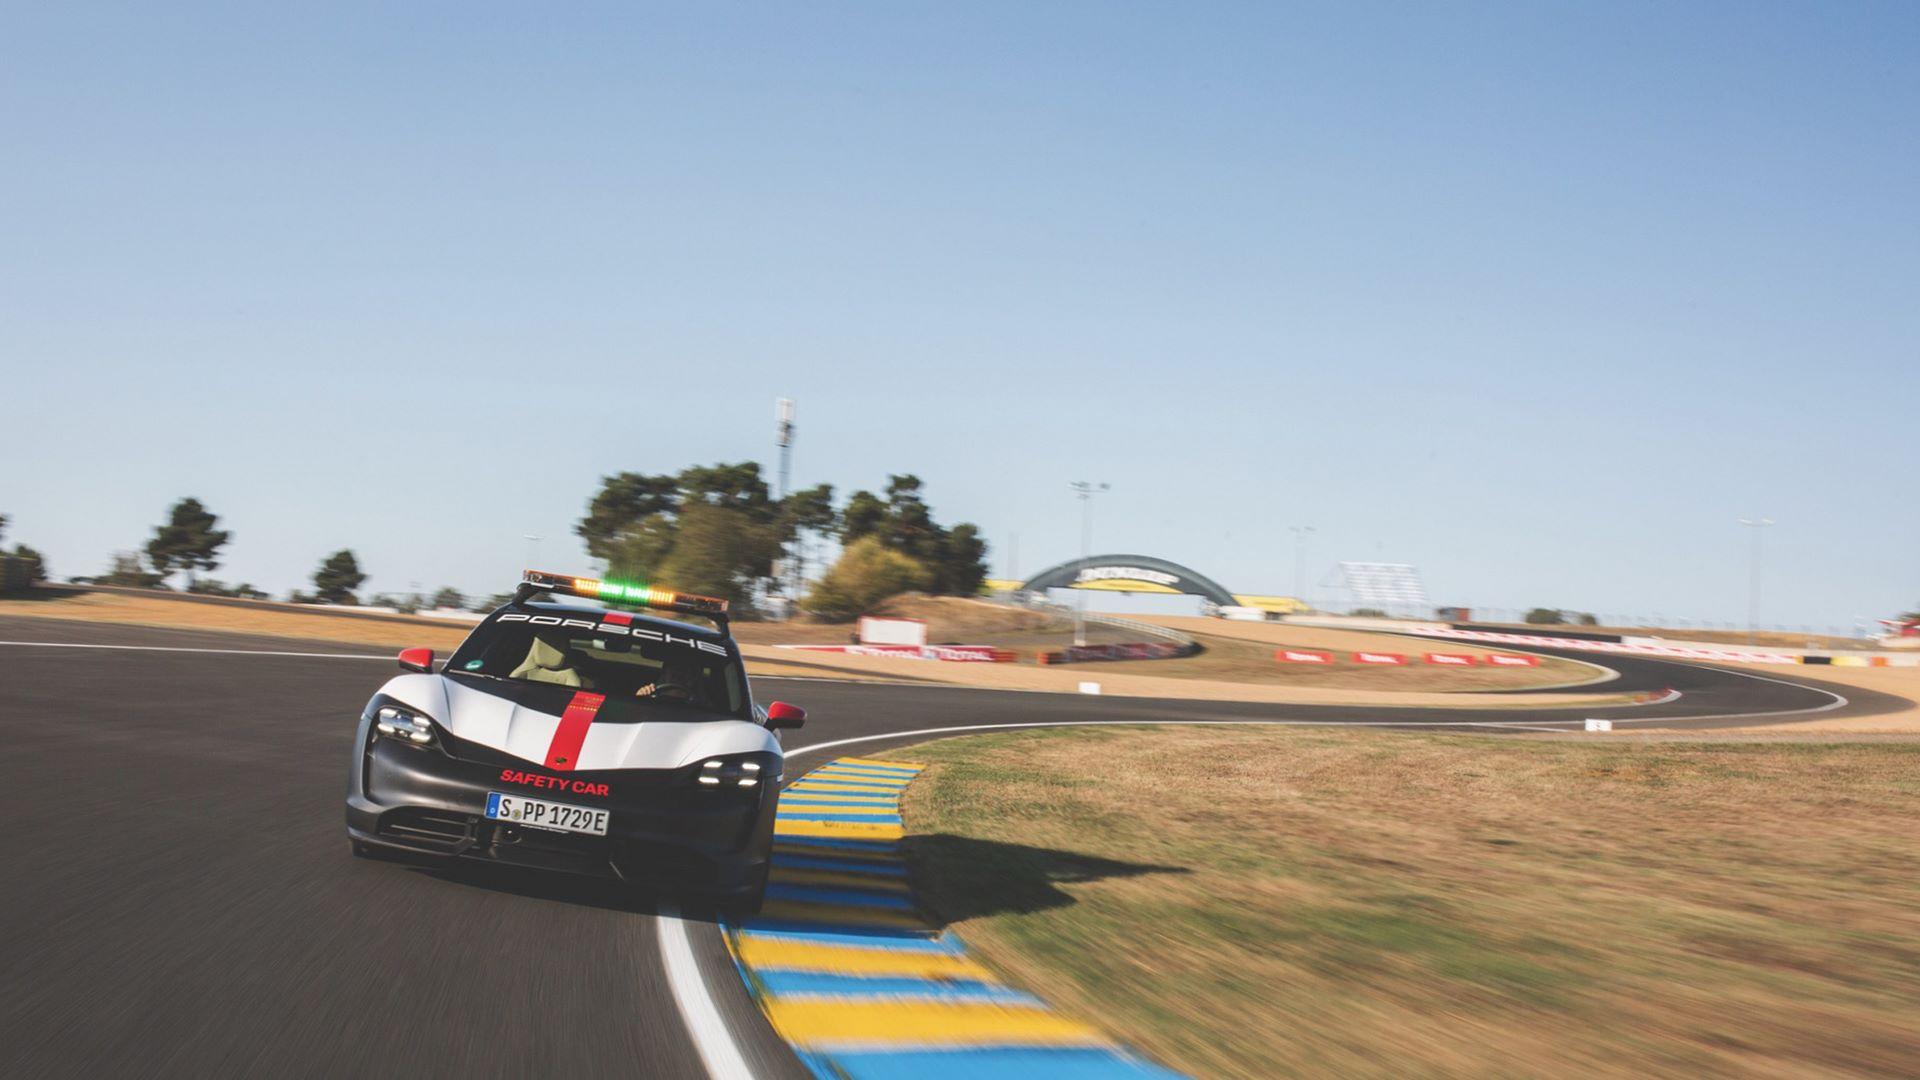 Porsche-Taycan-Turbo-safety-car-Le-Mans-2020-17